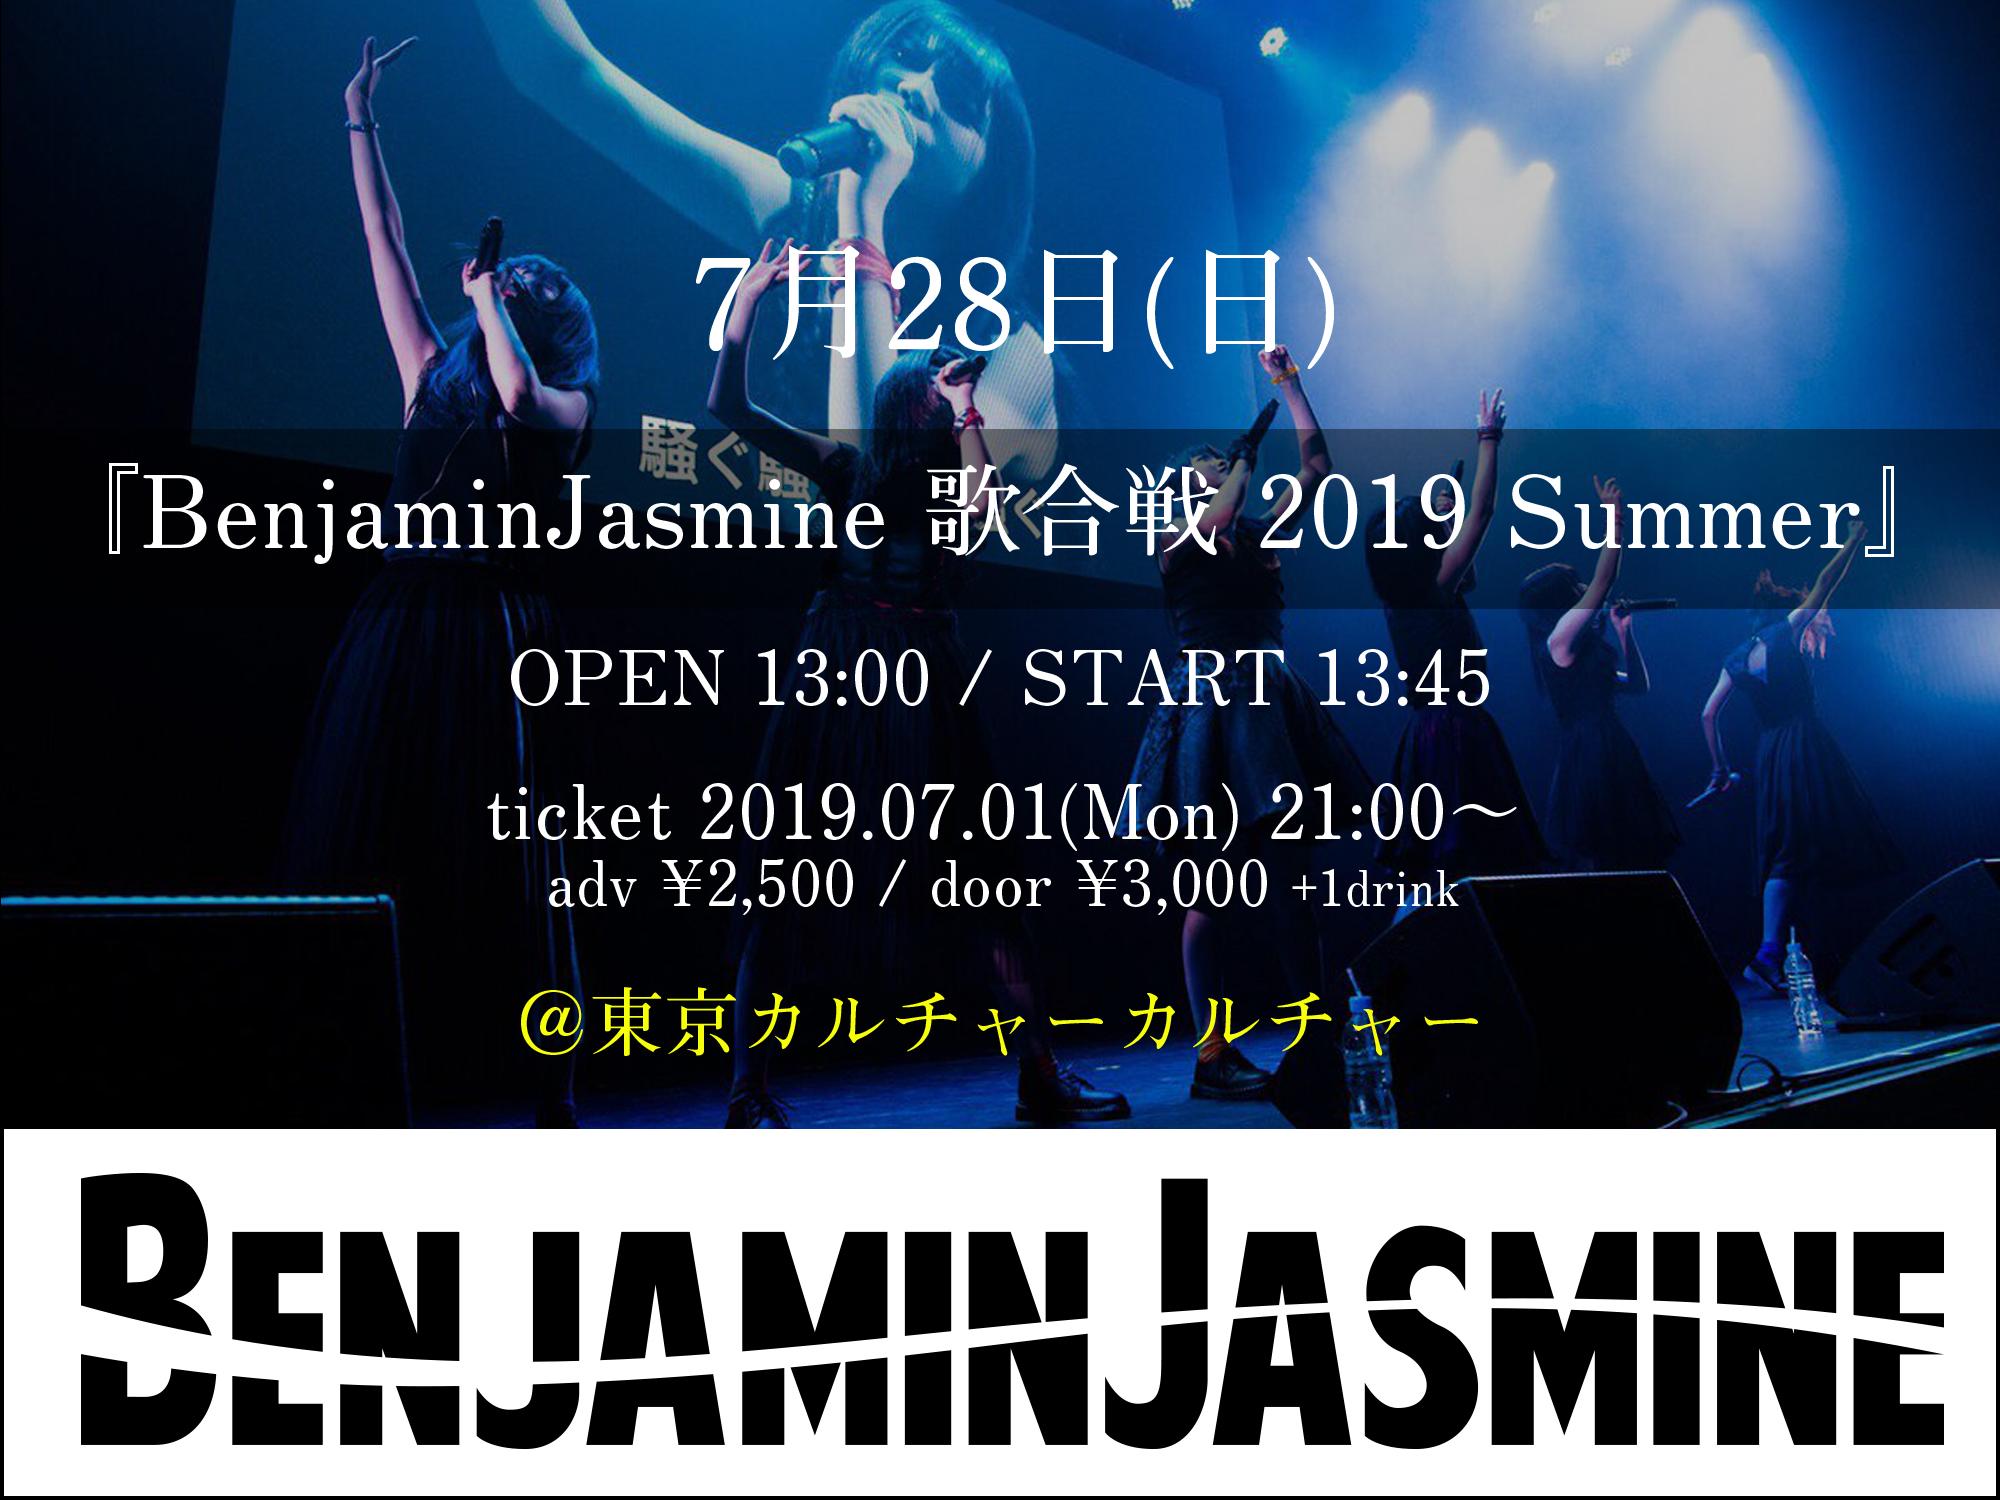 7月28日(日)『BenjaminJasmine 歌合戦 2019 Summer』開催決定